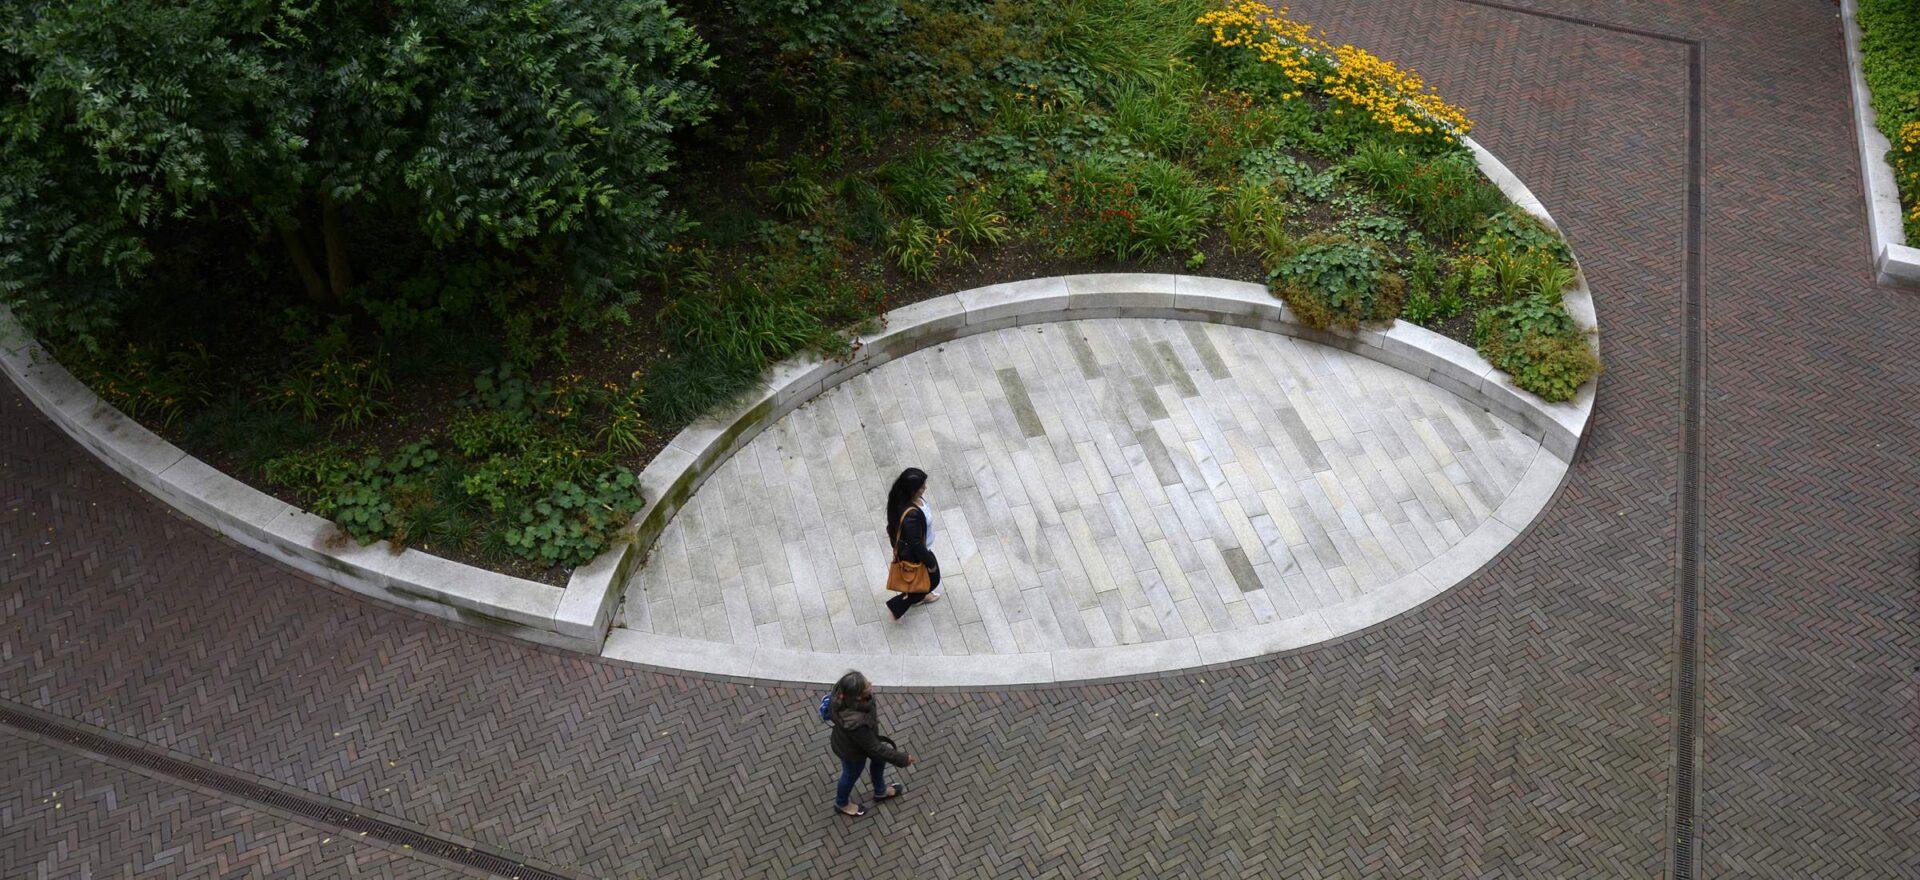 LANDLAB OEVERHOEK courtyard garden yellow from above_1